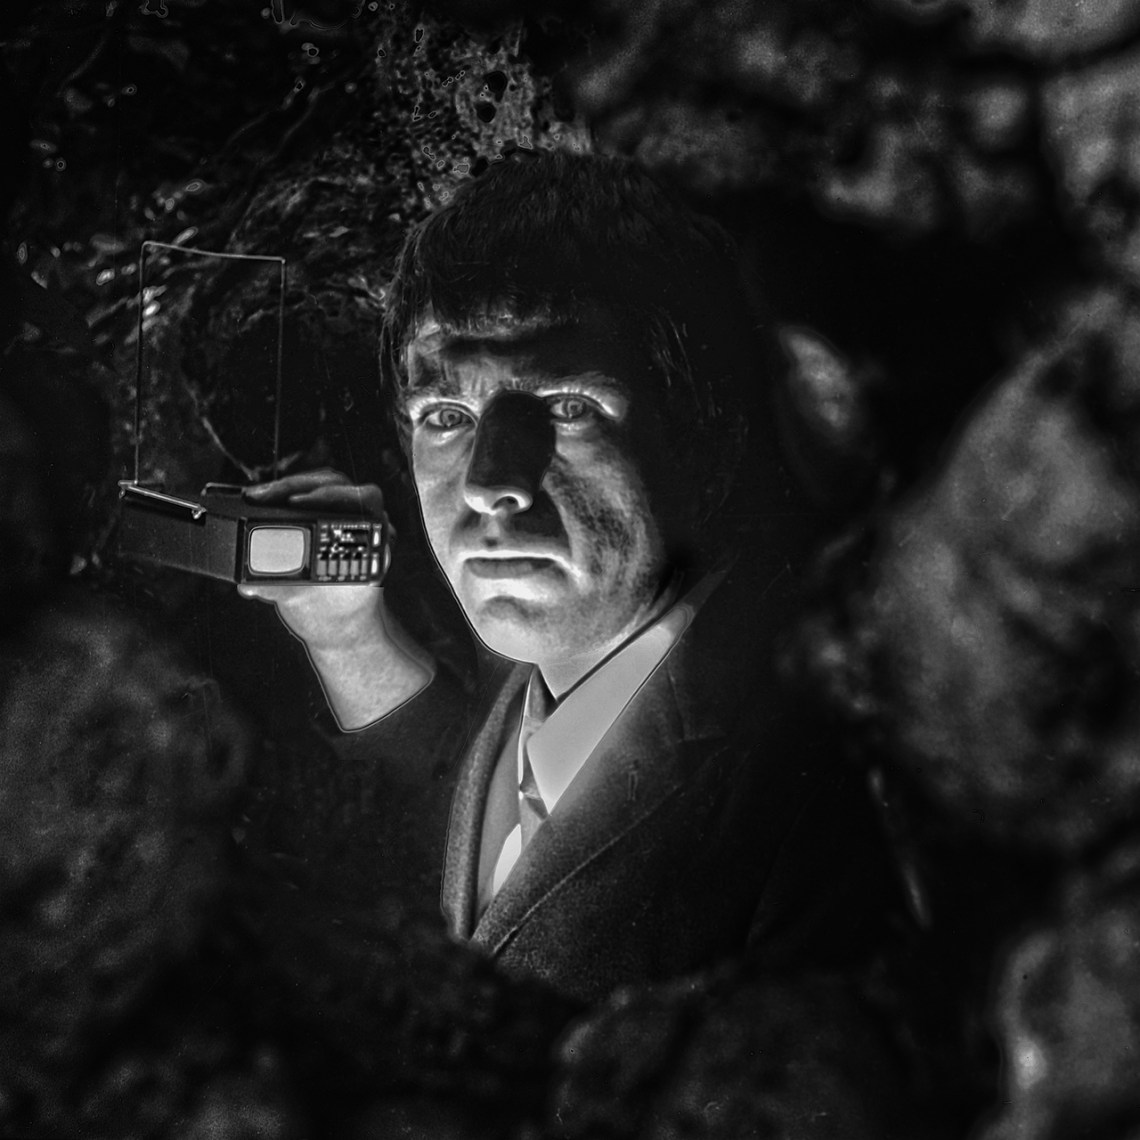 Peter-Gabrial_TV-Cave-Arrowsmith.©.jpg